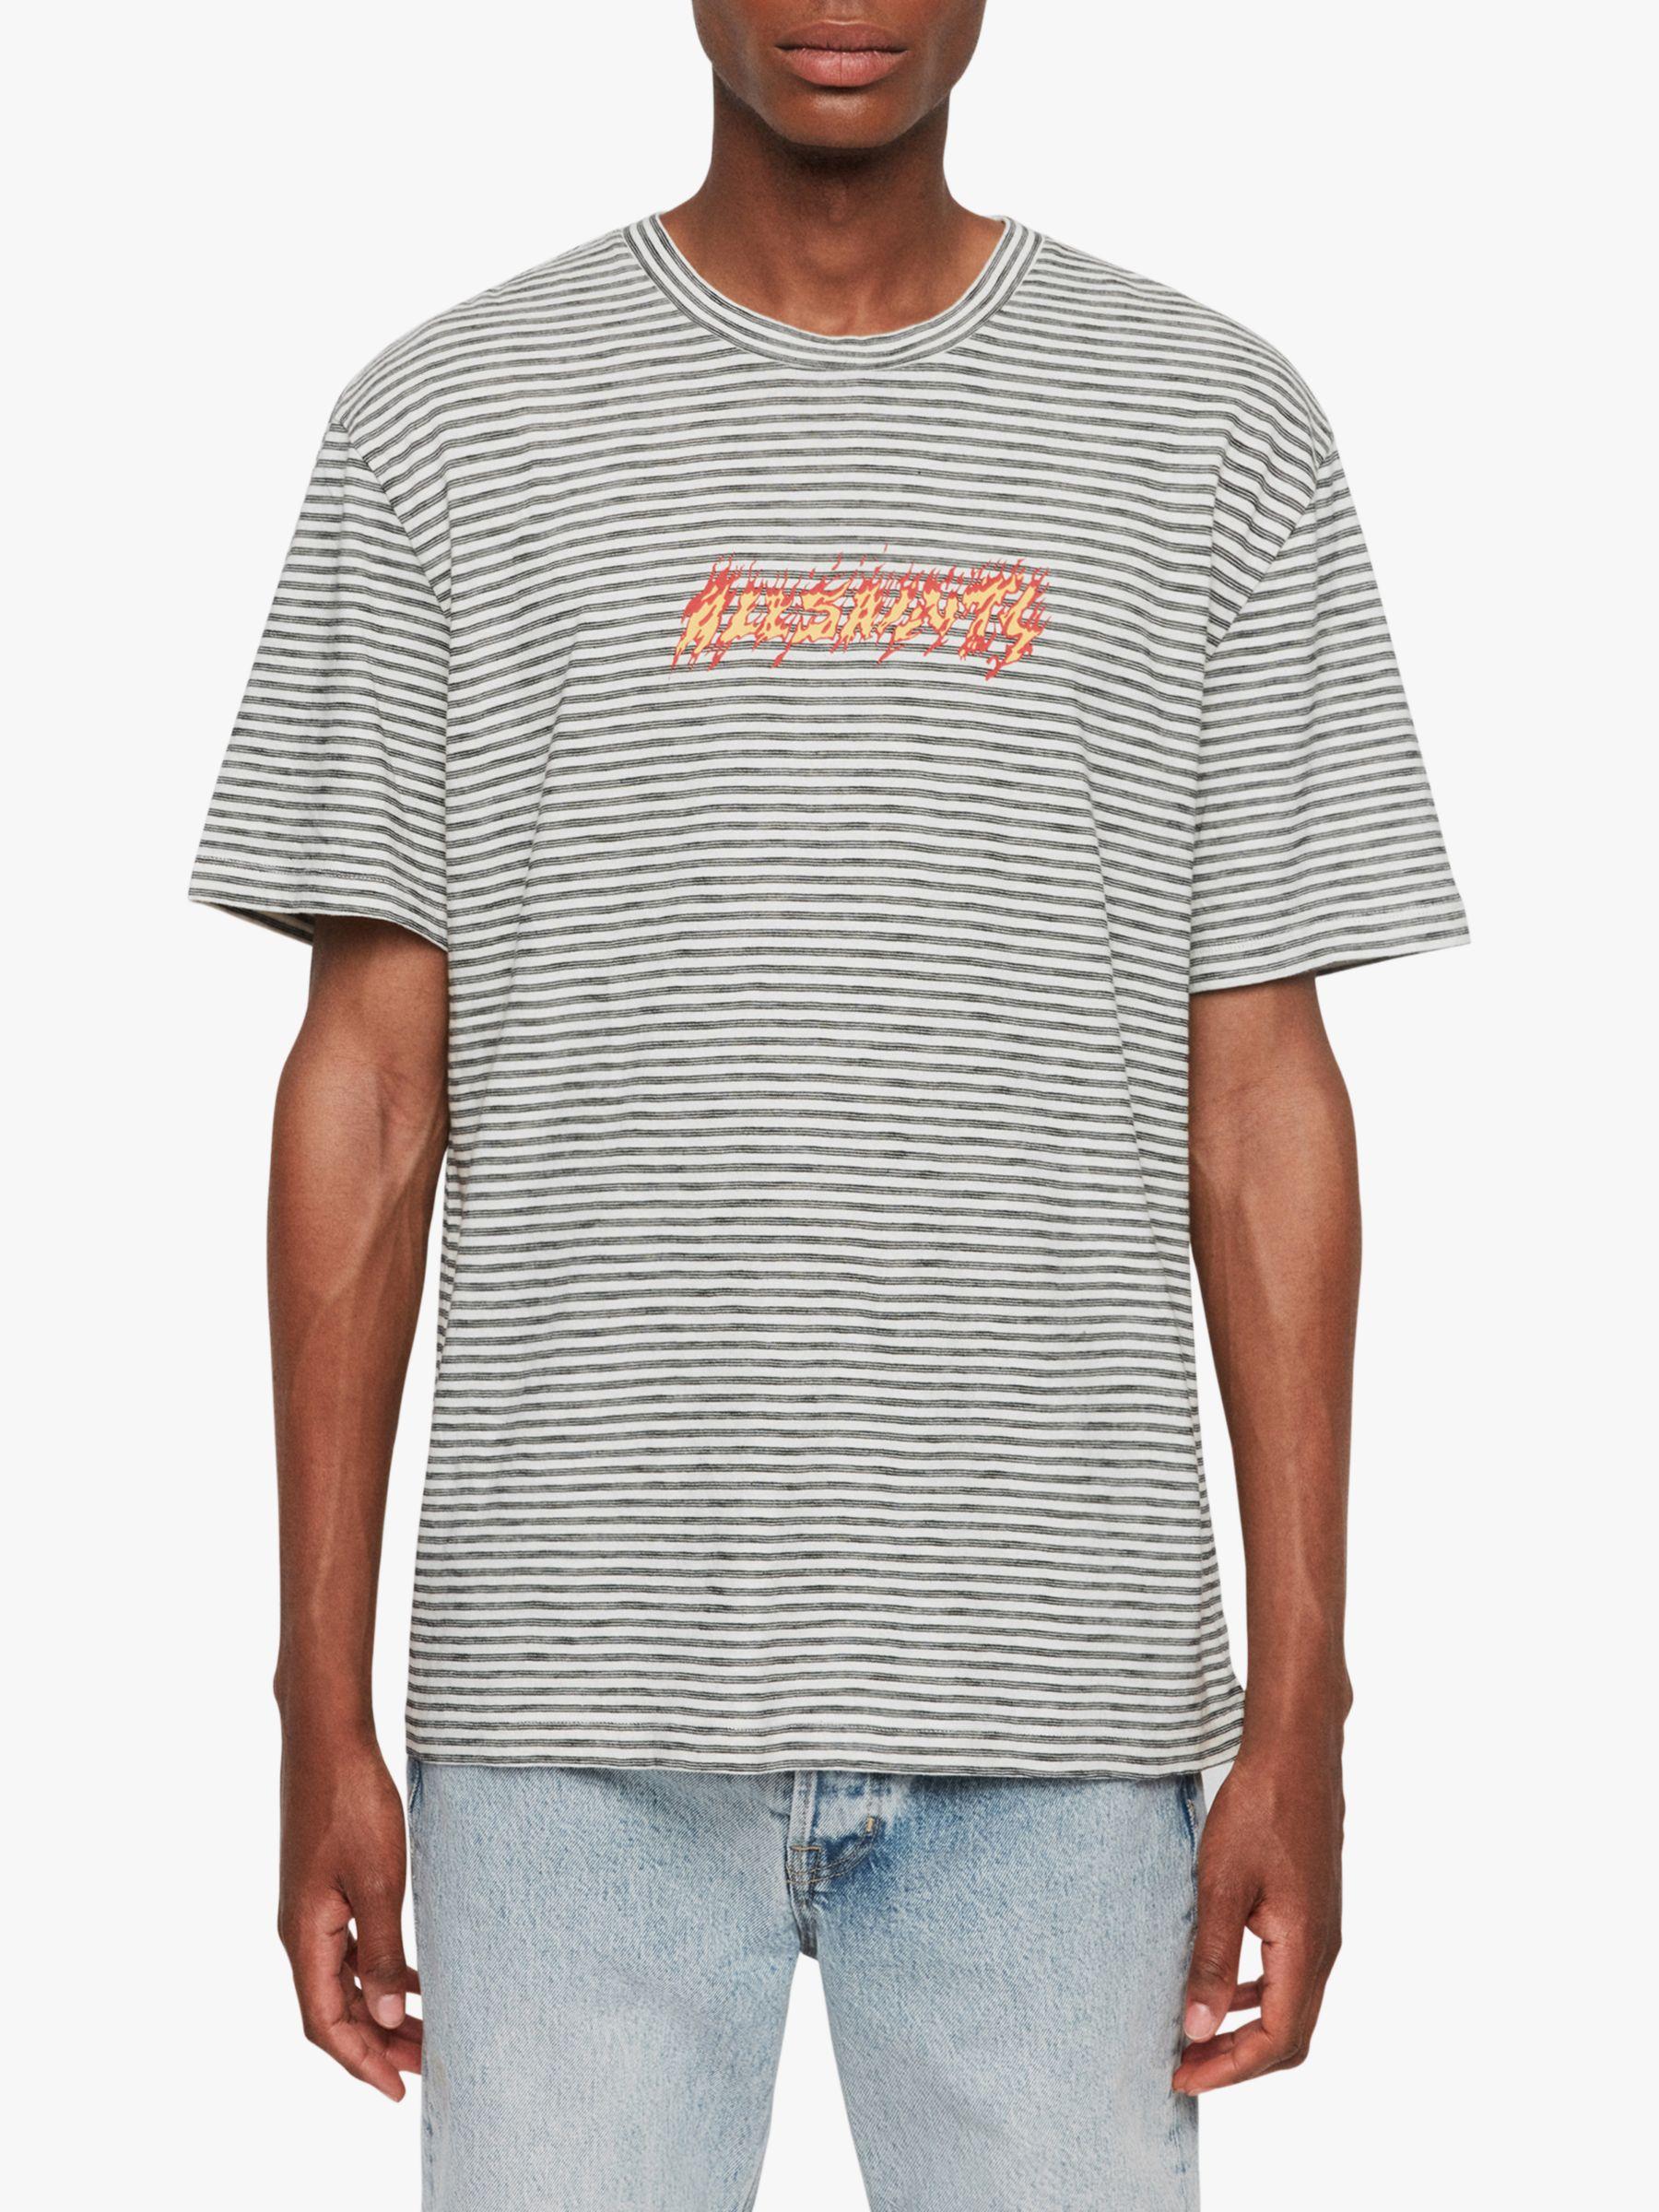 AllSaints AllSaints Burner Stripe Crew T-Shirt, Chalk/Washed Black